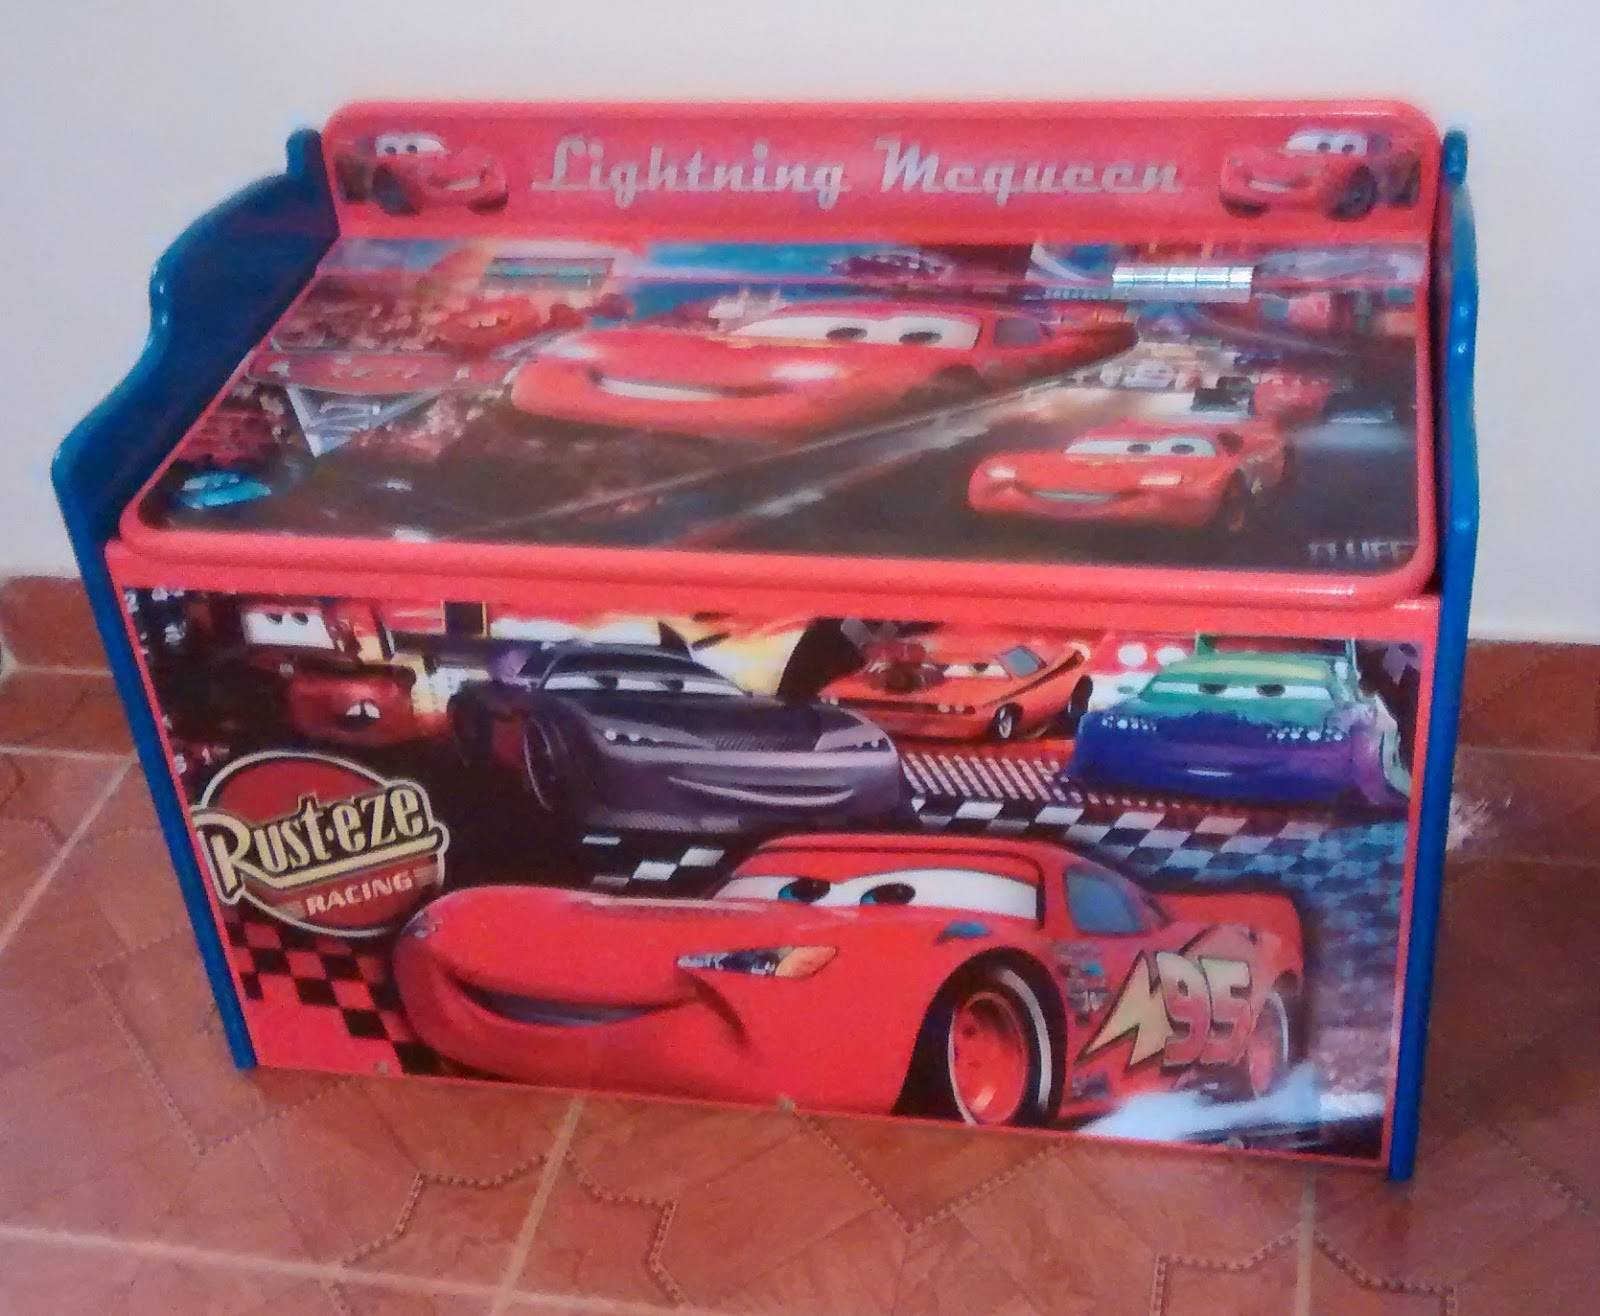 Galeria arte y dise o madekids ba l para juguetes cars - Baul para guardar juguetes ...